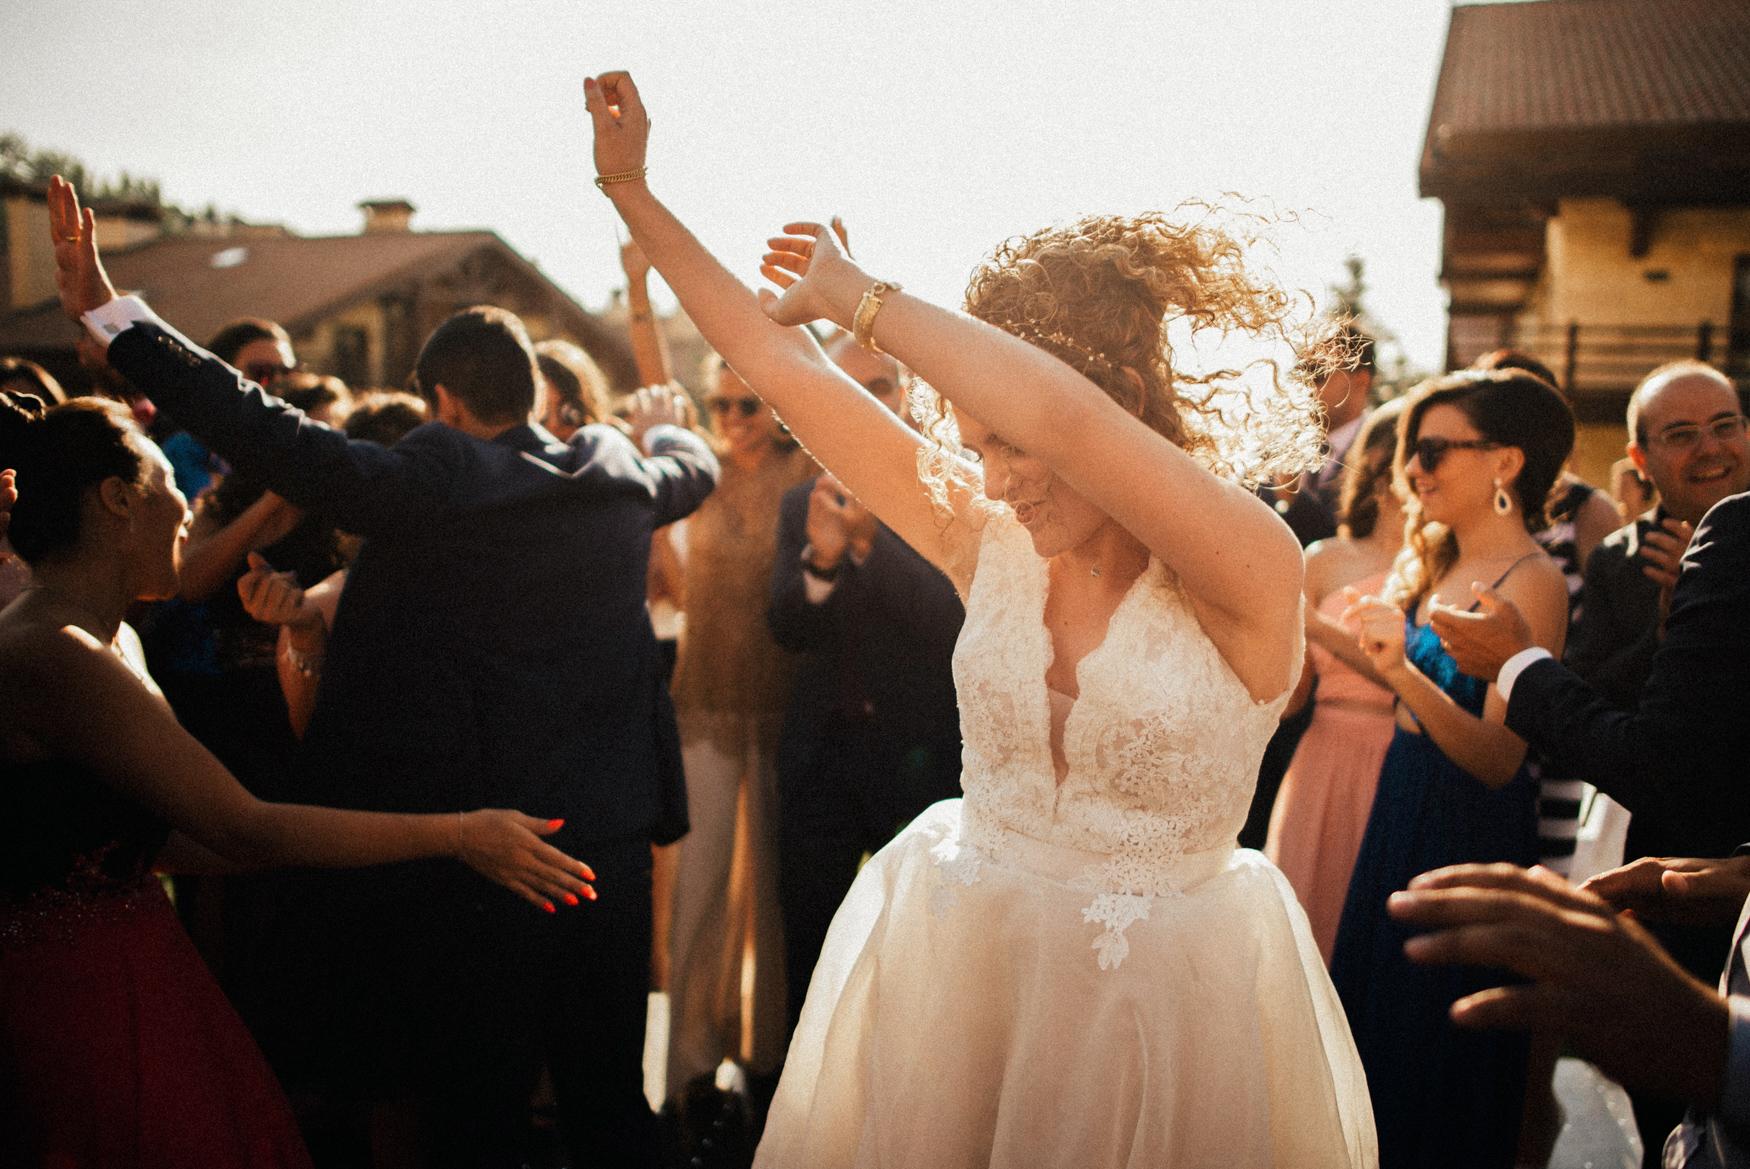 LR5 beirut lebanon mzaar intercontinental wedding photographer 008.jpg